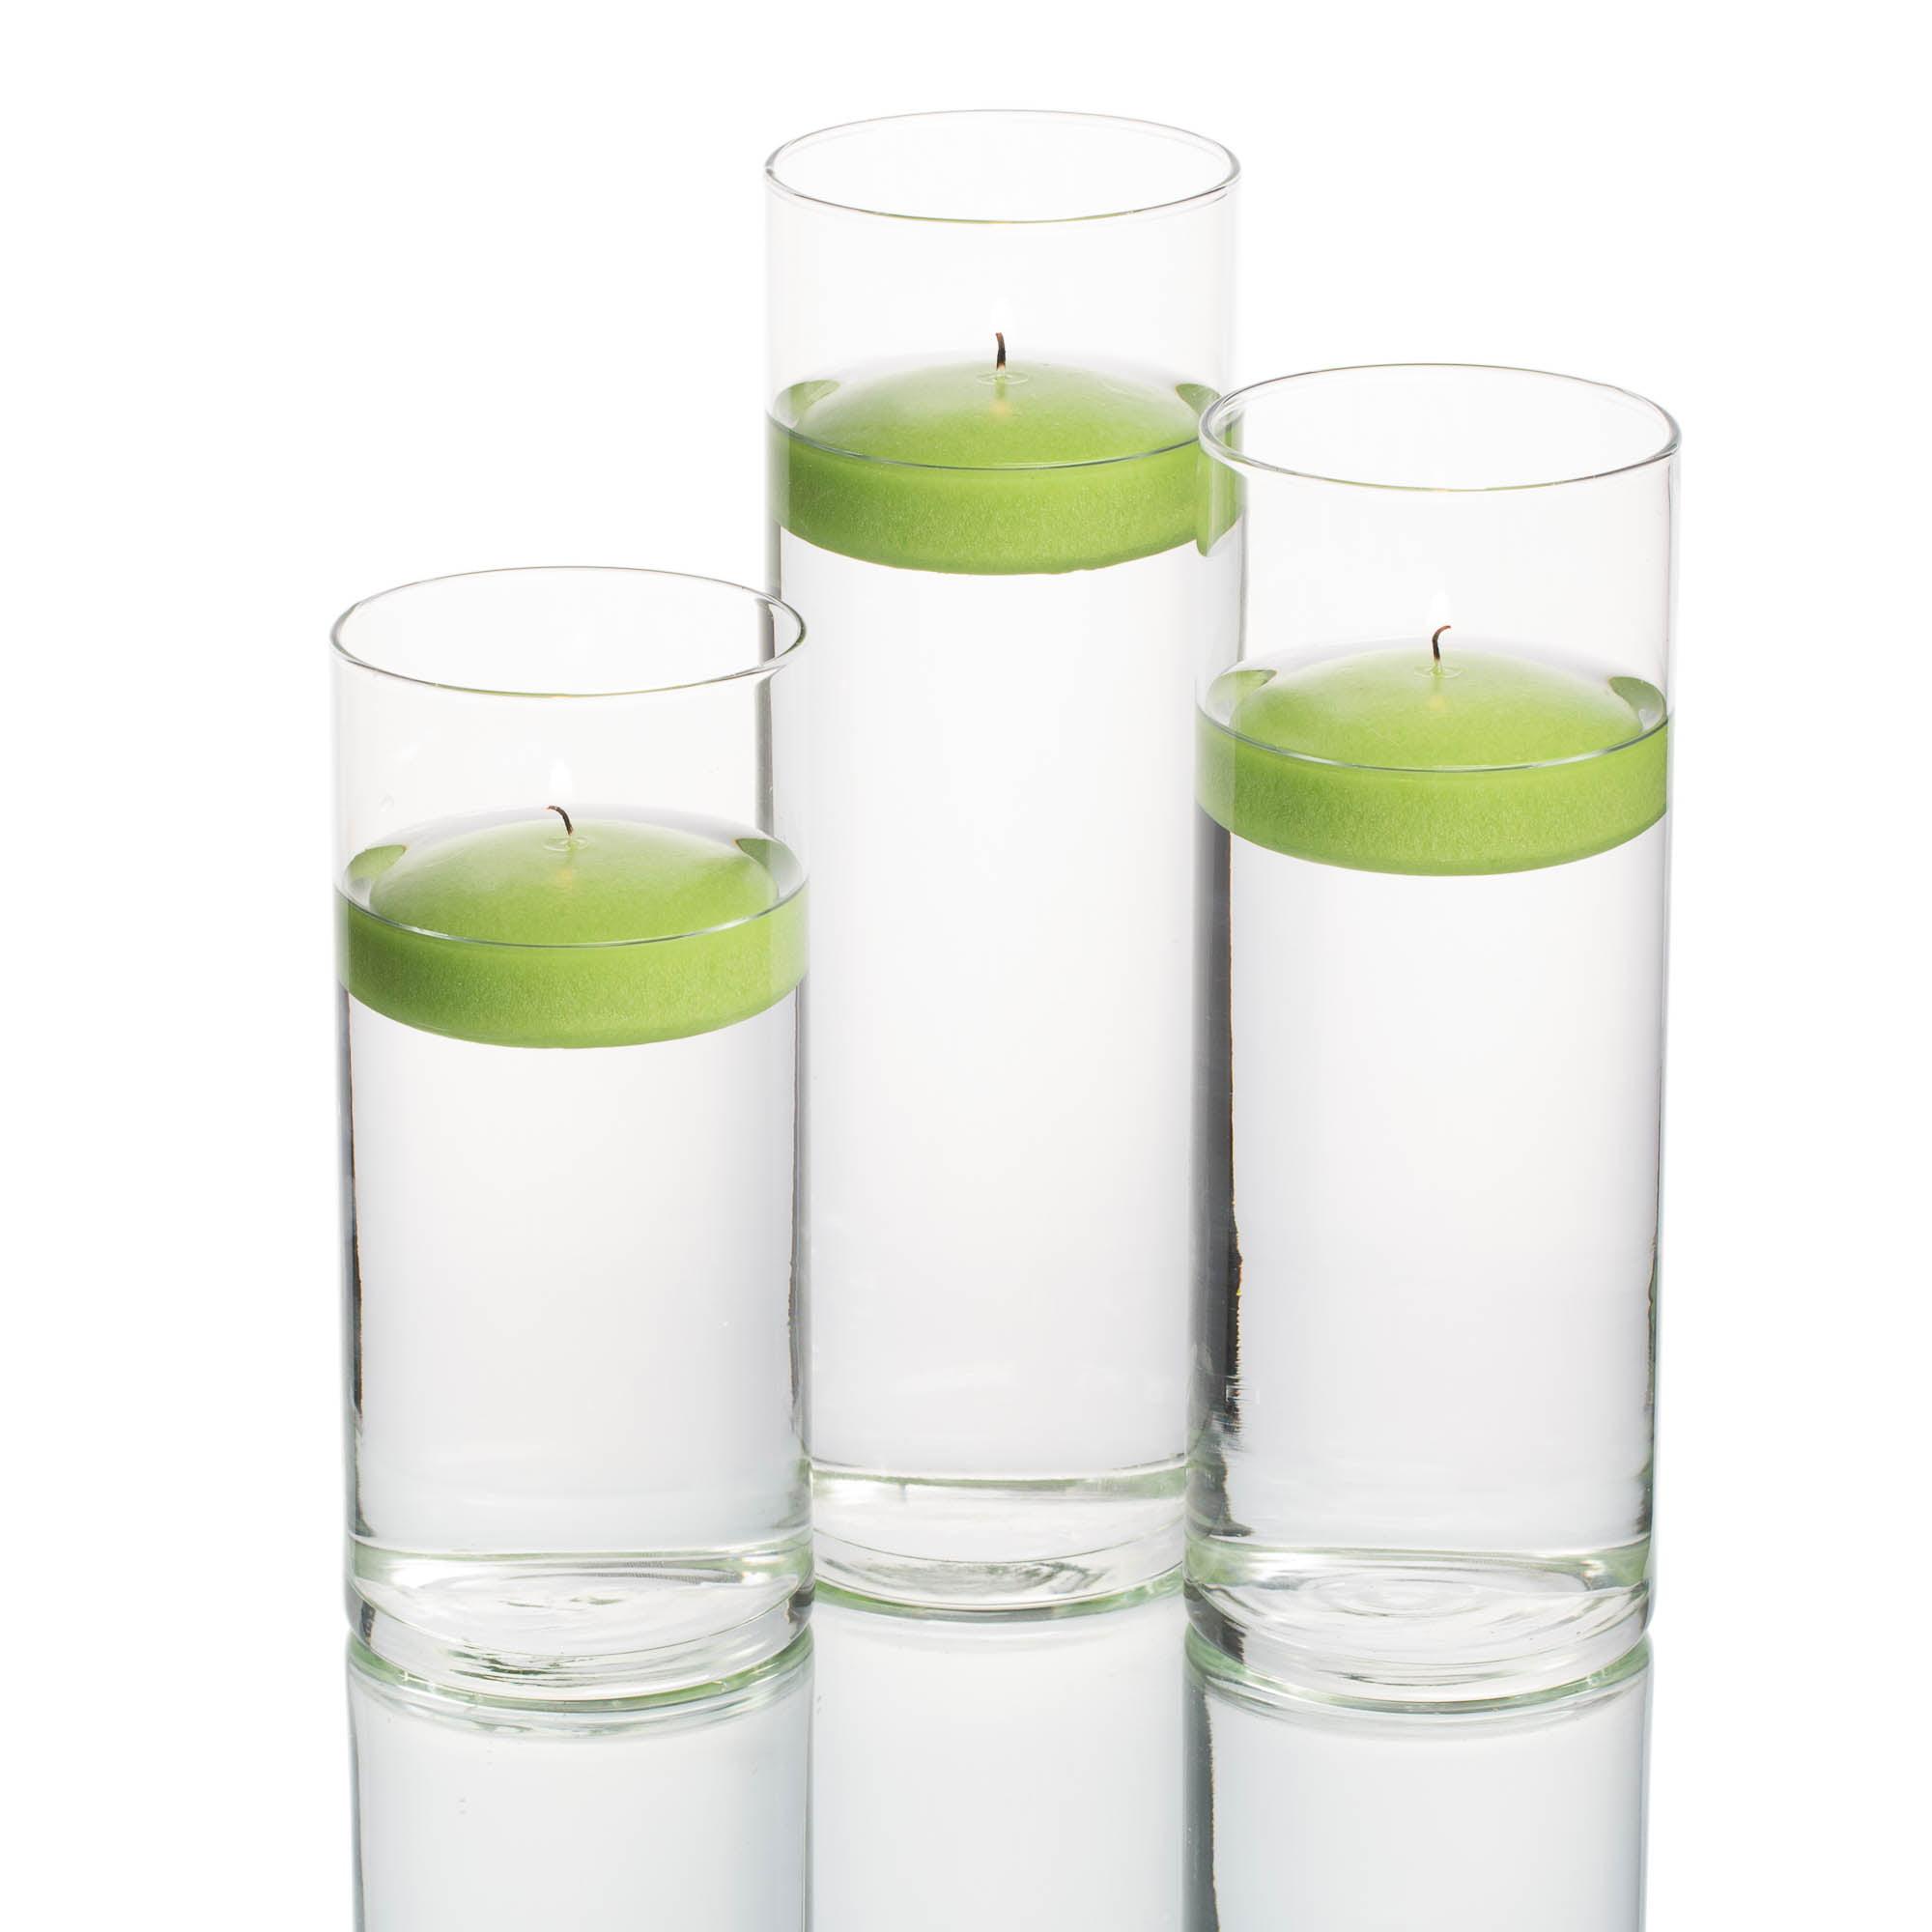 Richland Floating Candles & Eastland Cylinder Holders White Set of 3